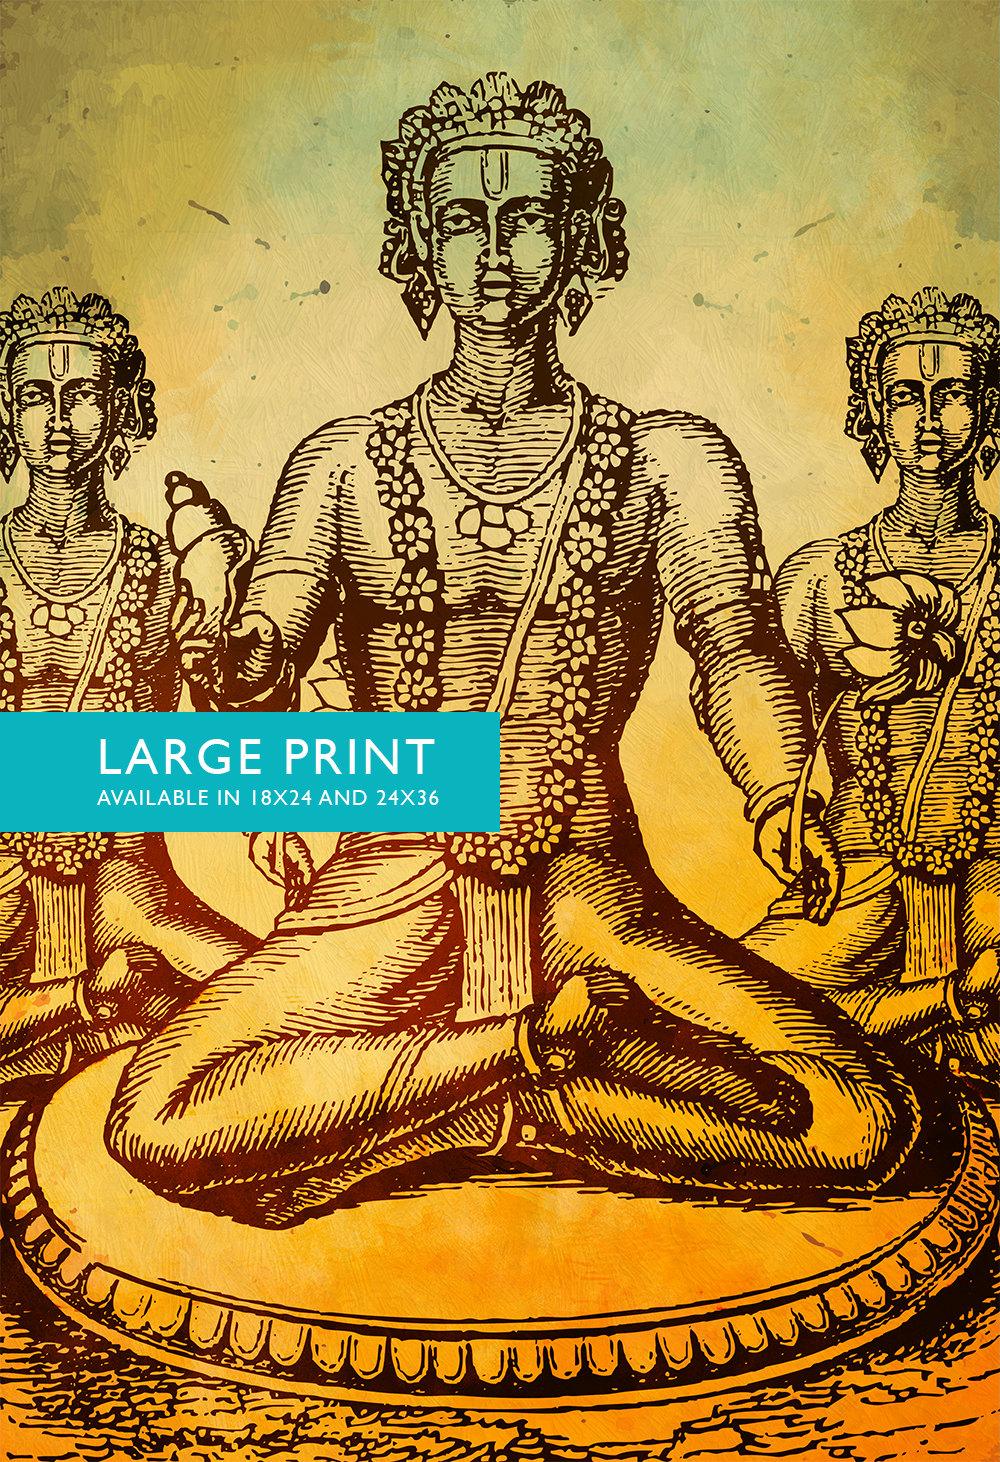 Hindu God Vishnu Print Vintage Hindu Decor Wall Art – Giclee Print ...